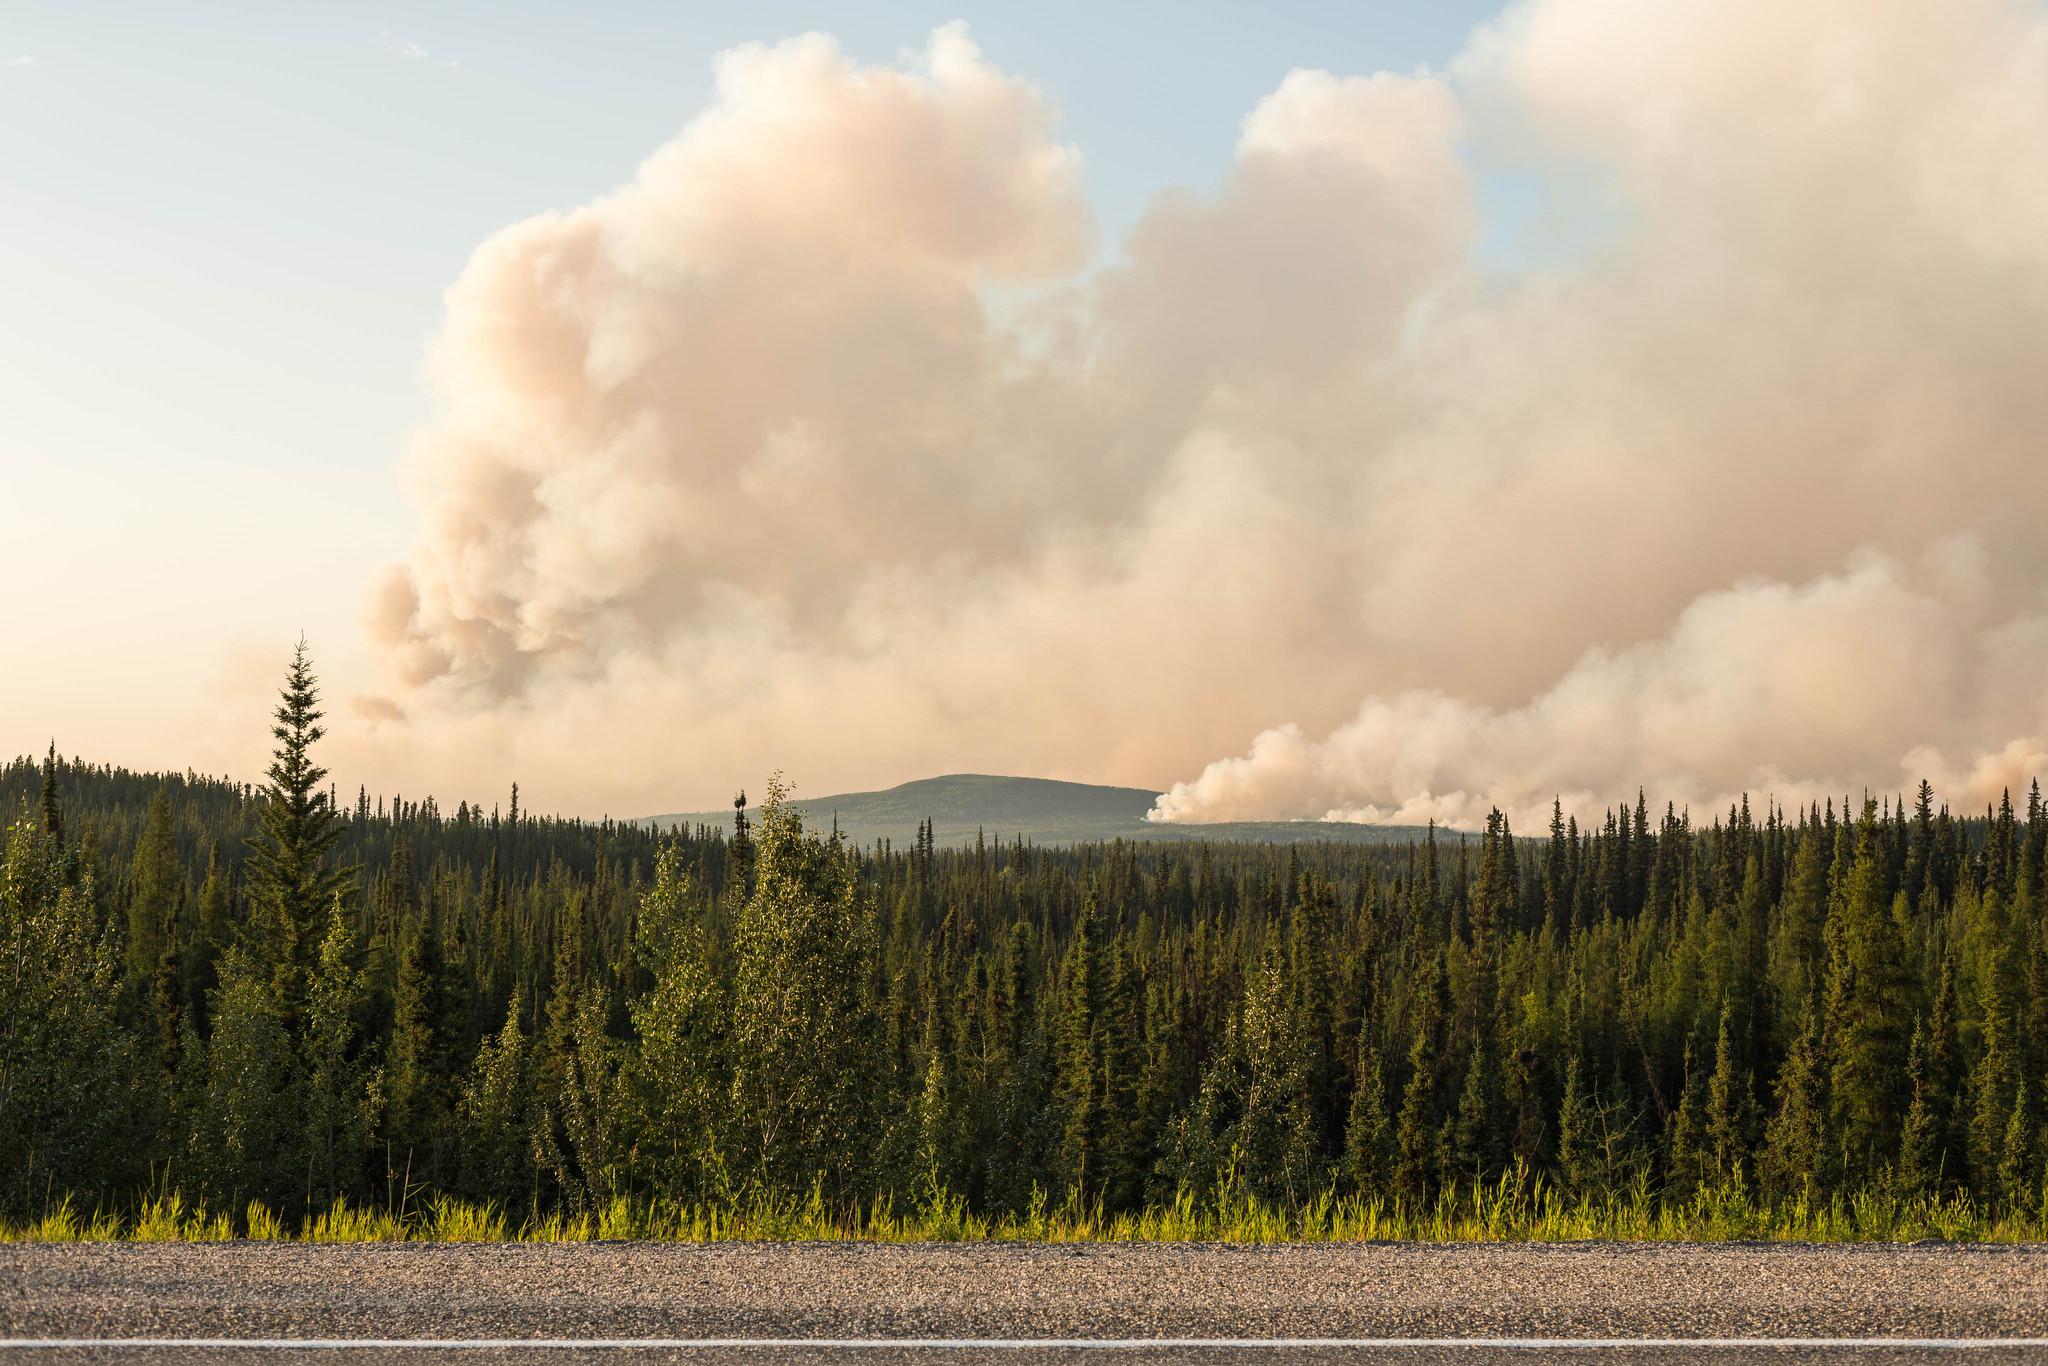 A wildfire burns near the Alaska Highway south of Watson Lake, Yukon on Sunday, July 5, 2015. (Loren Holmes / ADN)